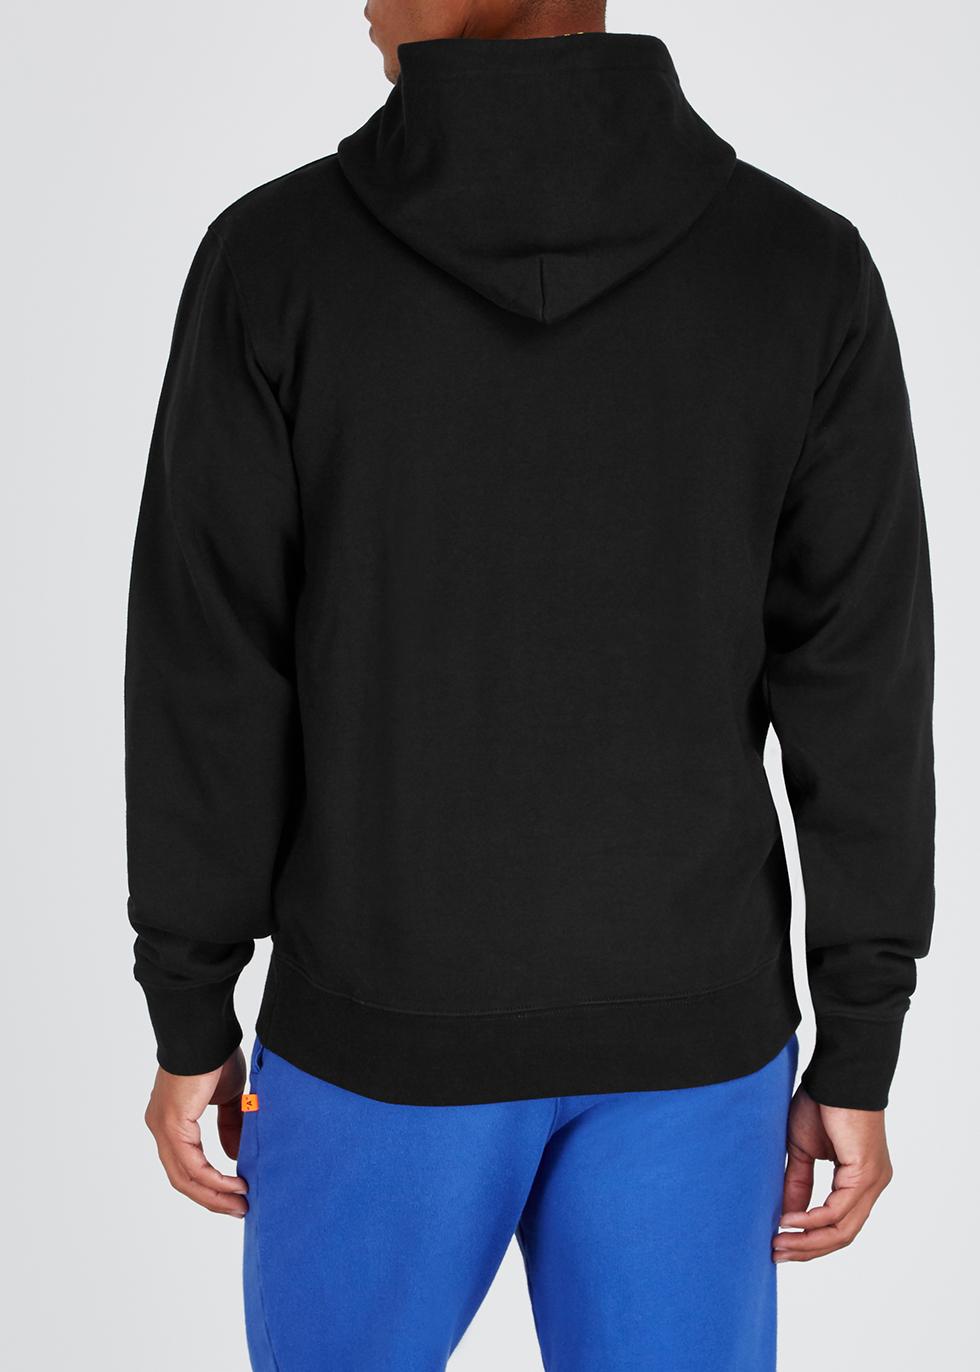 Fish Camo hooded cotton sweatshirt - Billionaire Boys Club